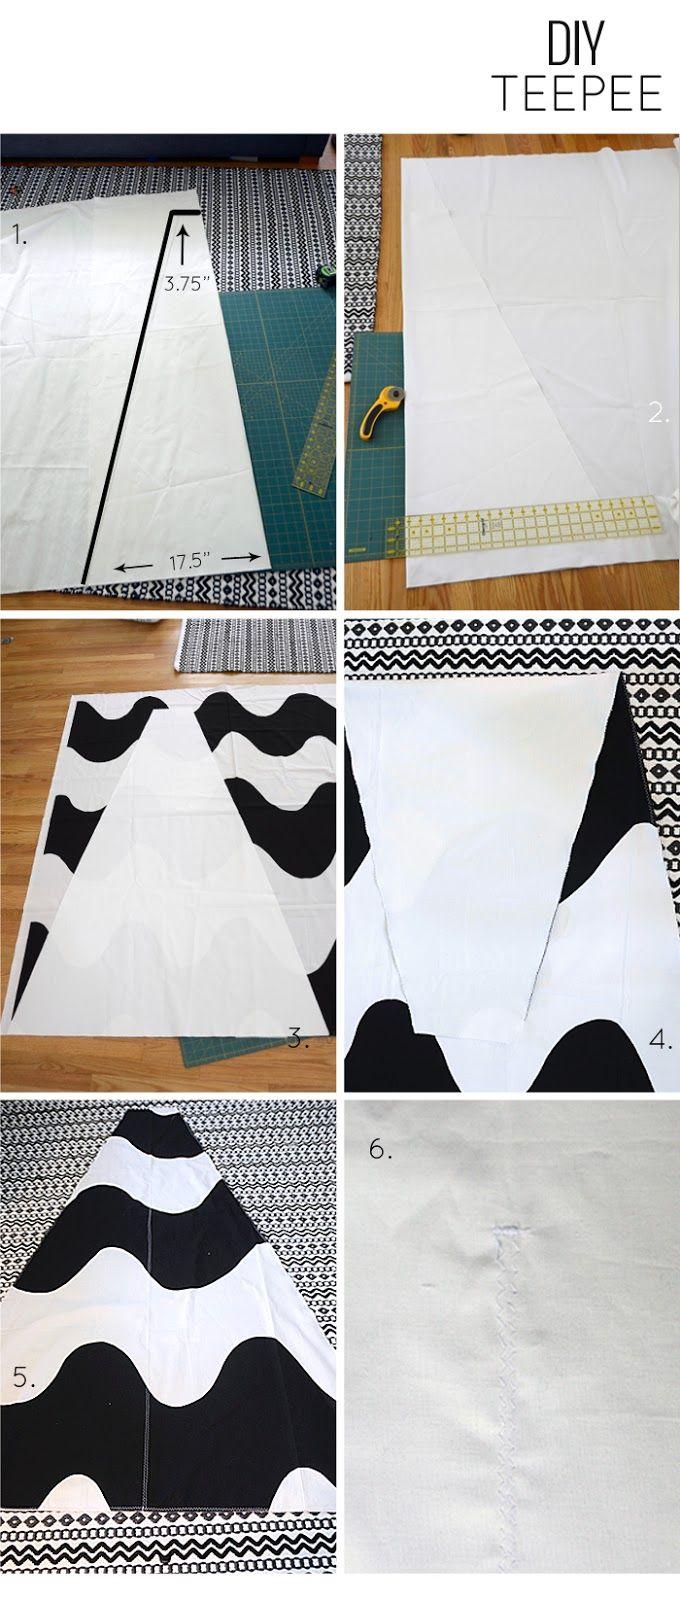 DIY 5 Panel Teepee